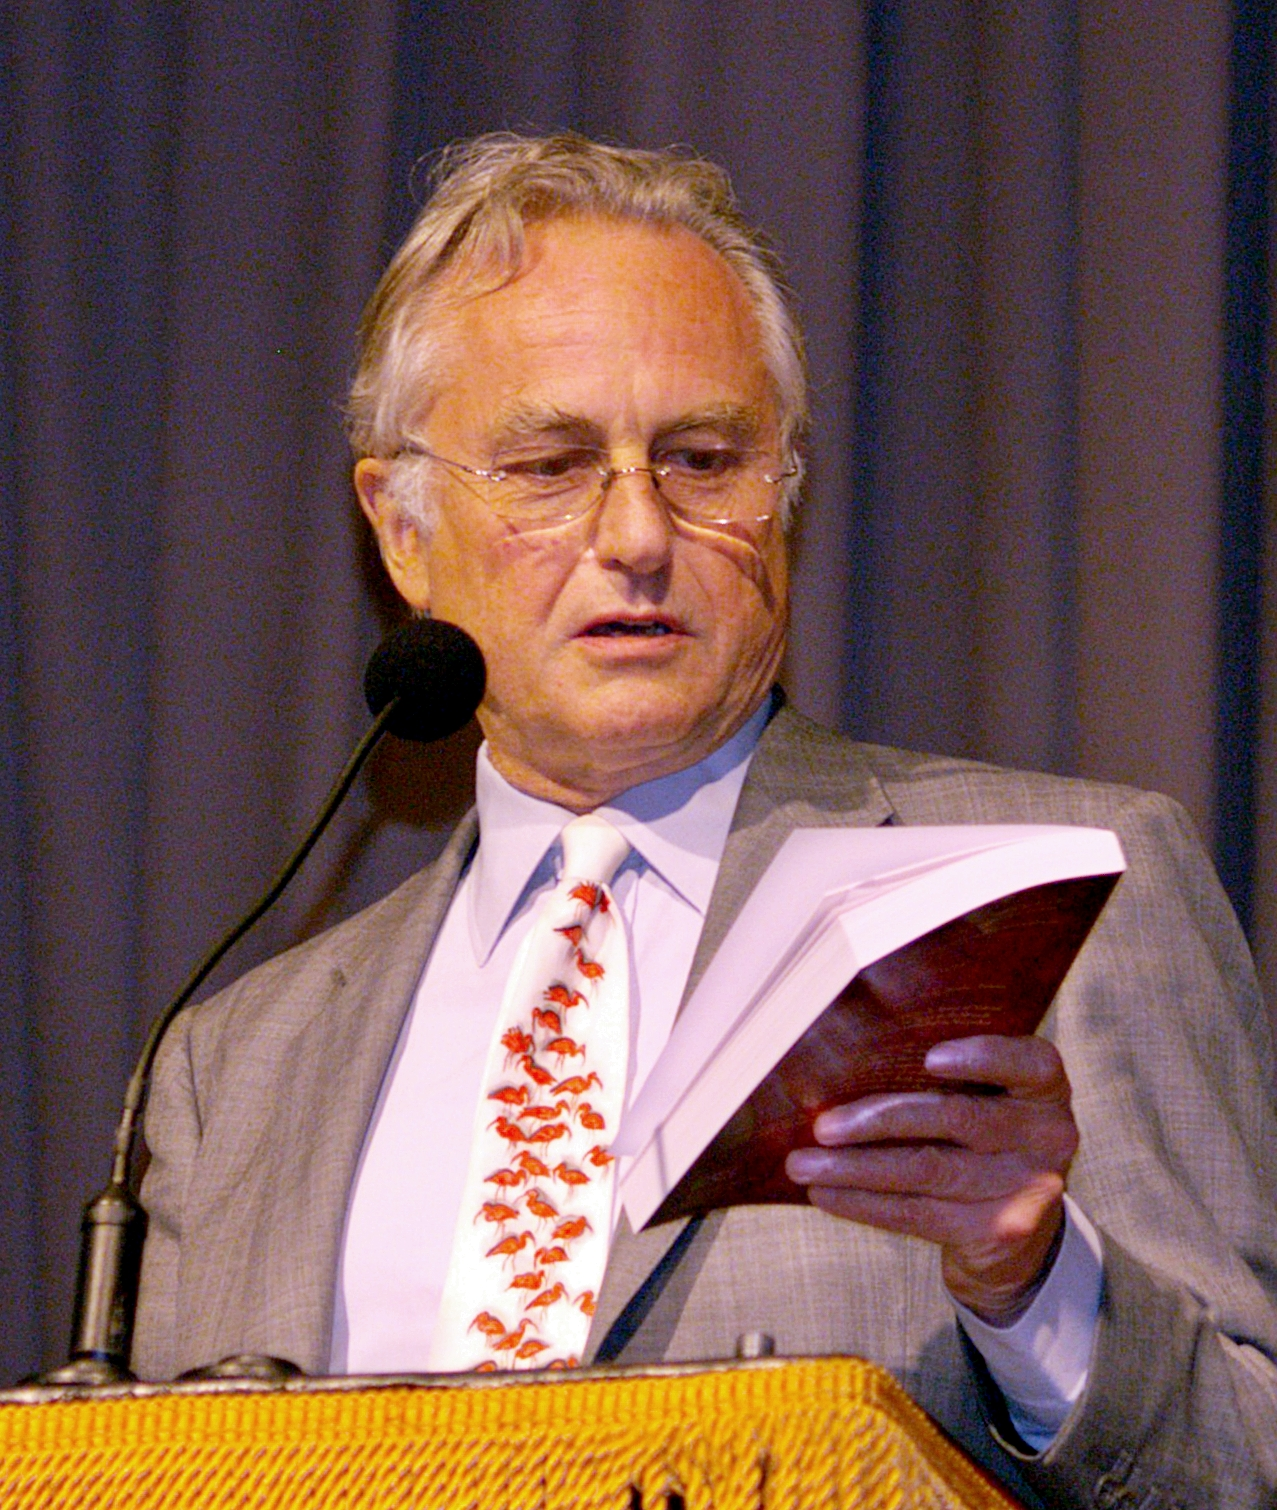 filerichard dawkins ridiculing ray comfort 2jpg